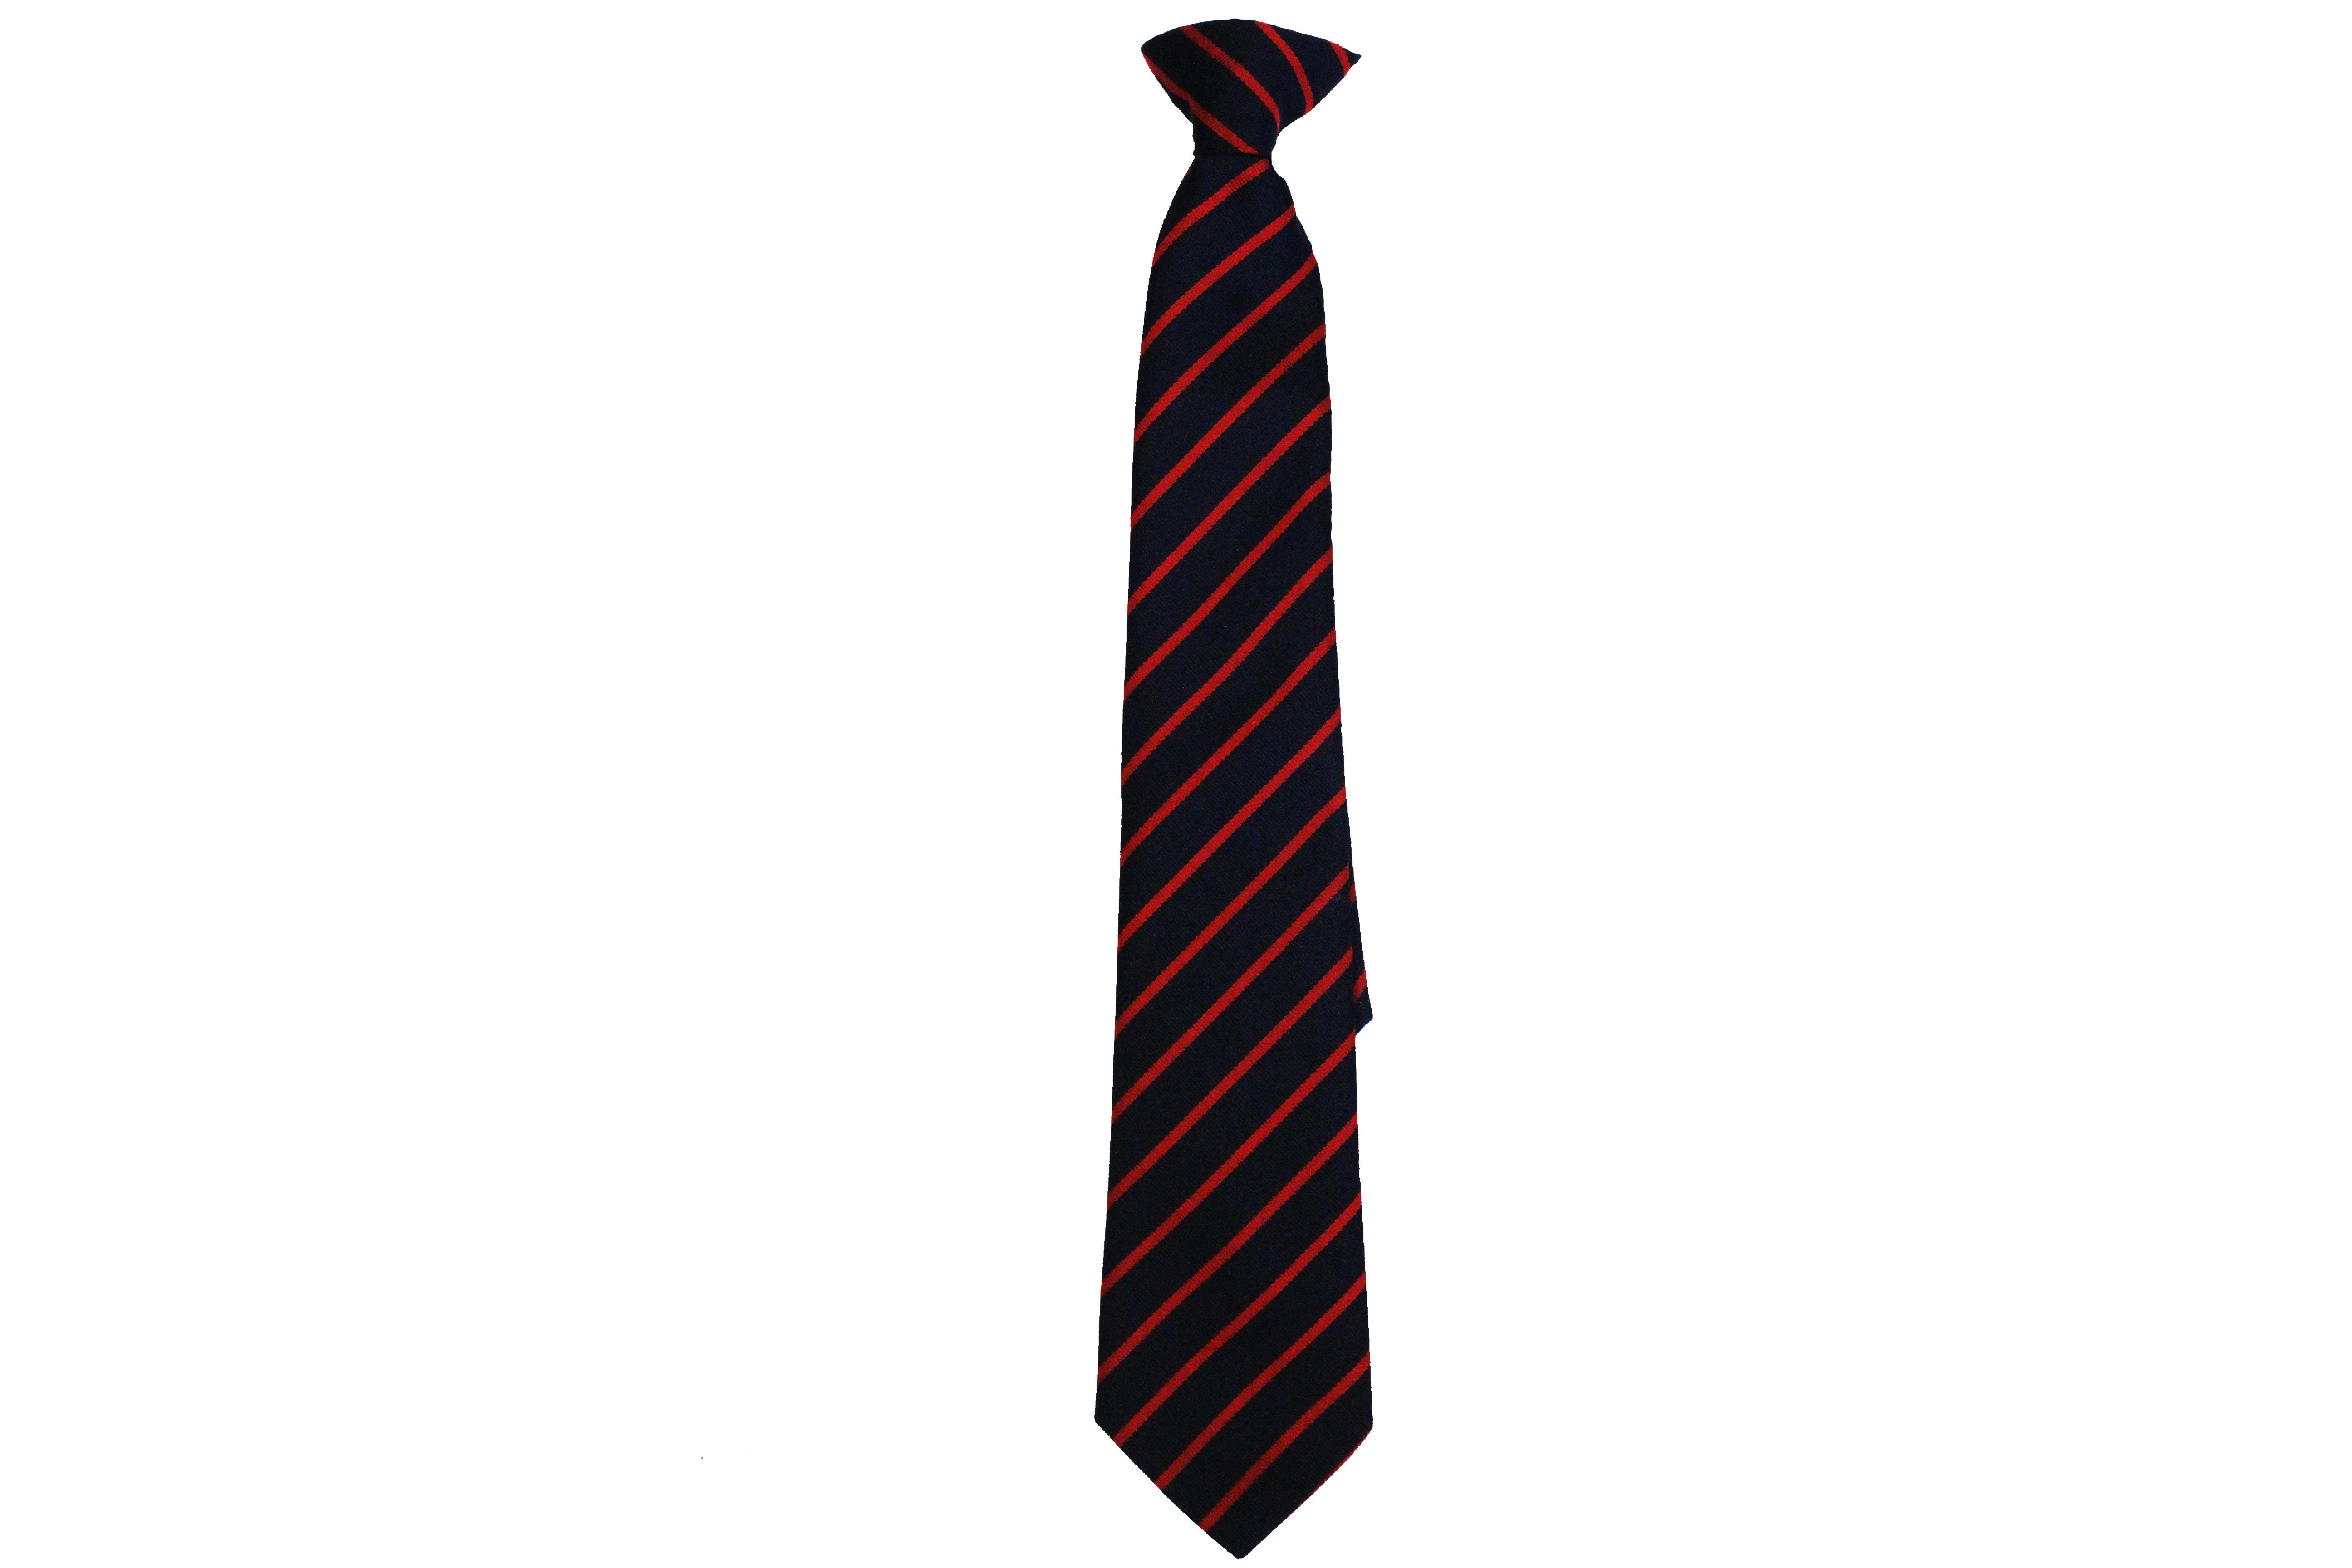 SWRA Tie - Dragoon - Red